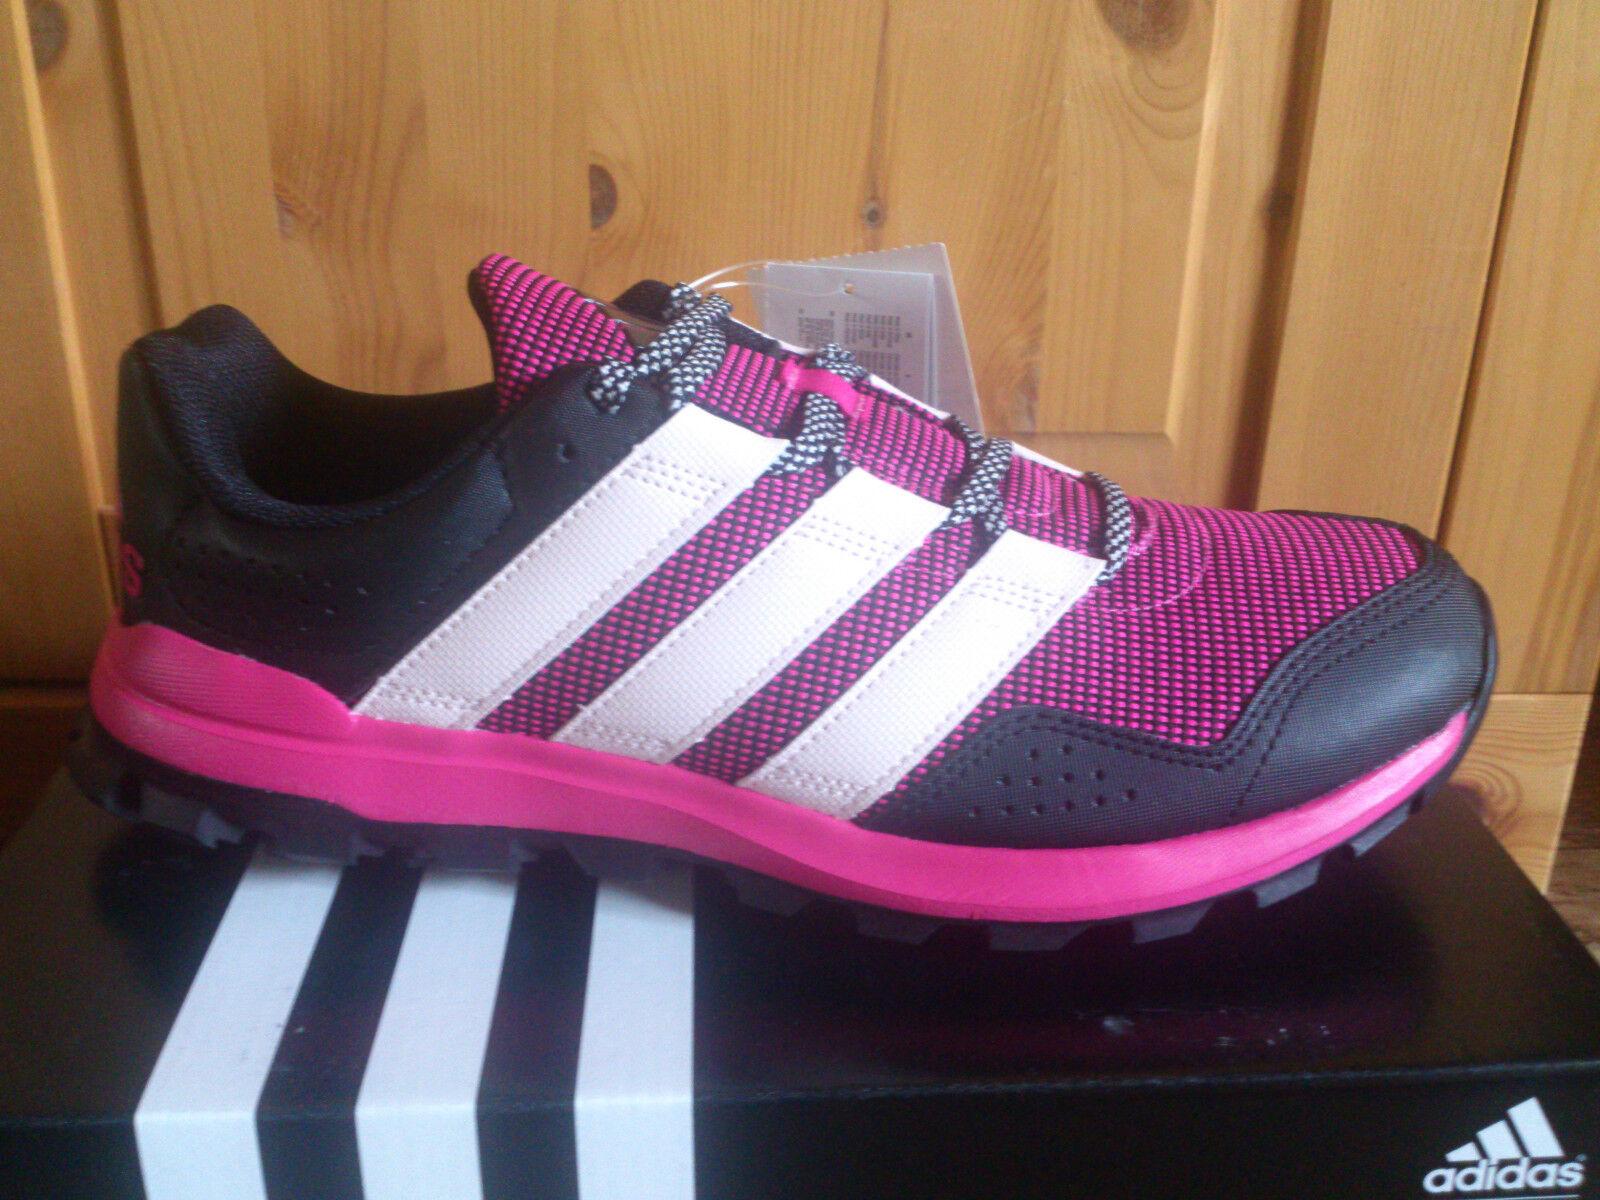 Adidas Slingshot TR W Damen Trail Laufschuhe 41 1 3 42  42 2 3 NEU